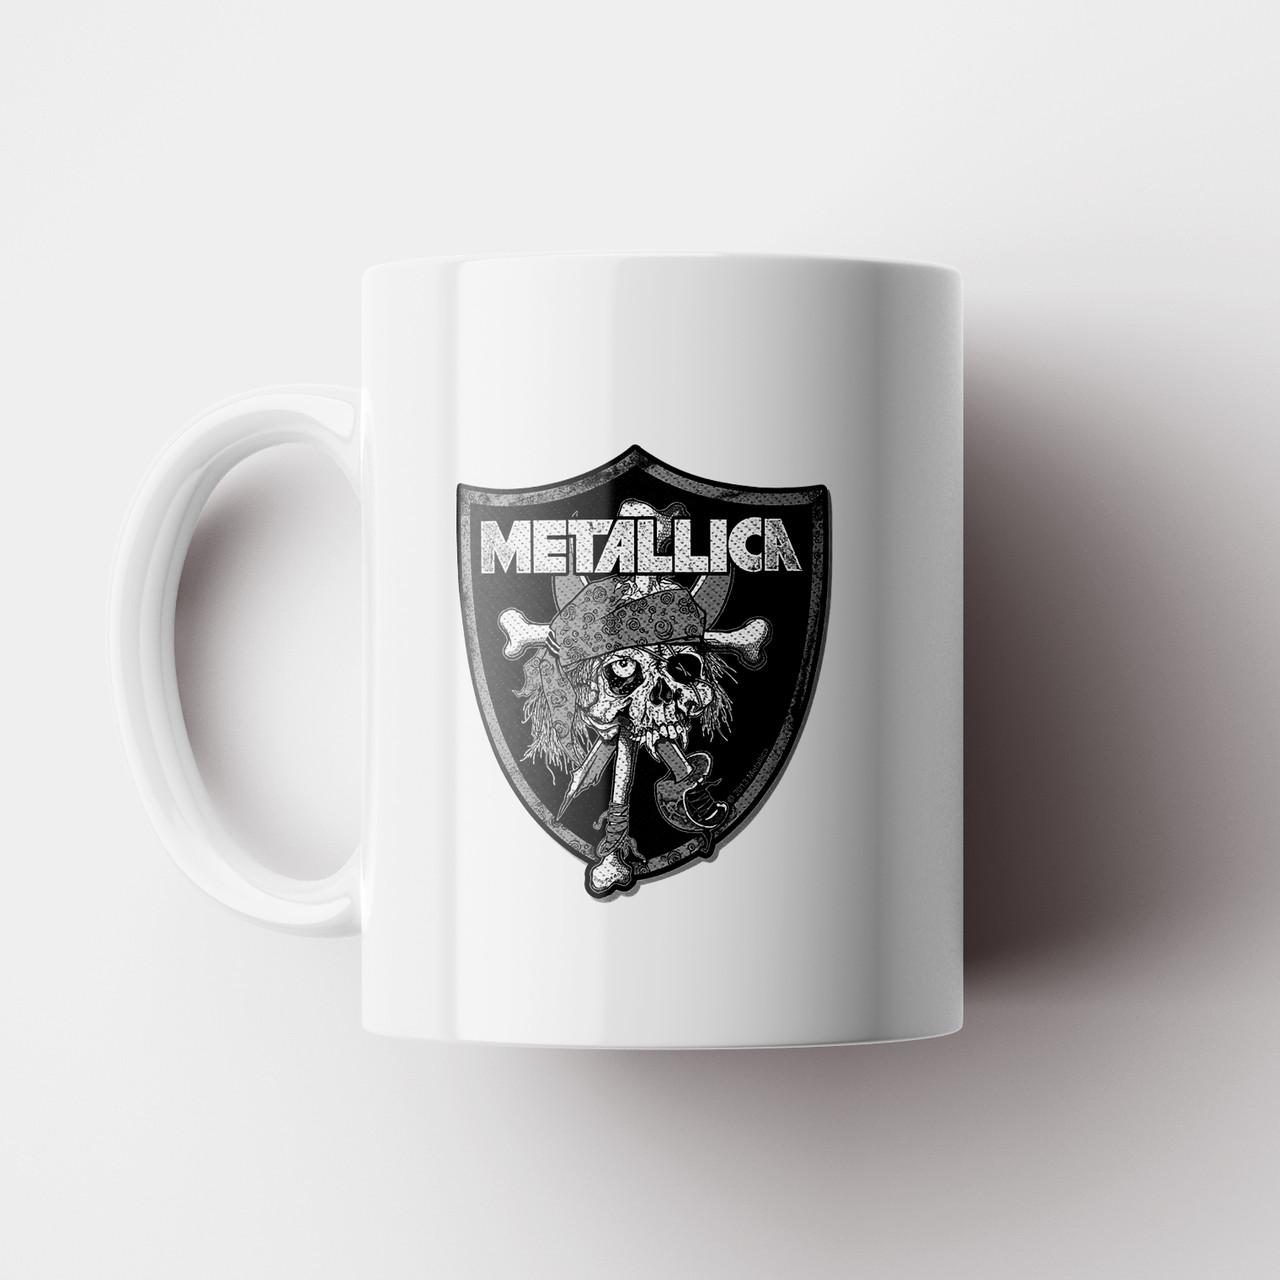 Чашка Metallica. Металлика. Музыка. Metal. Метал. Чашка с фото